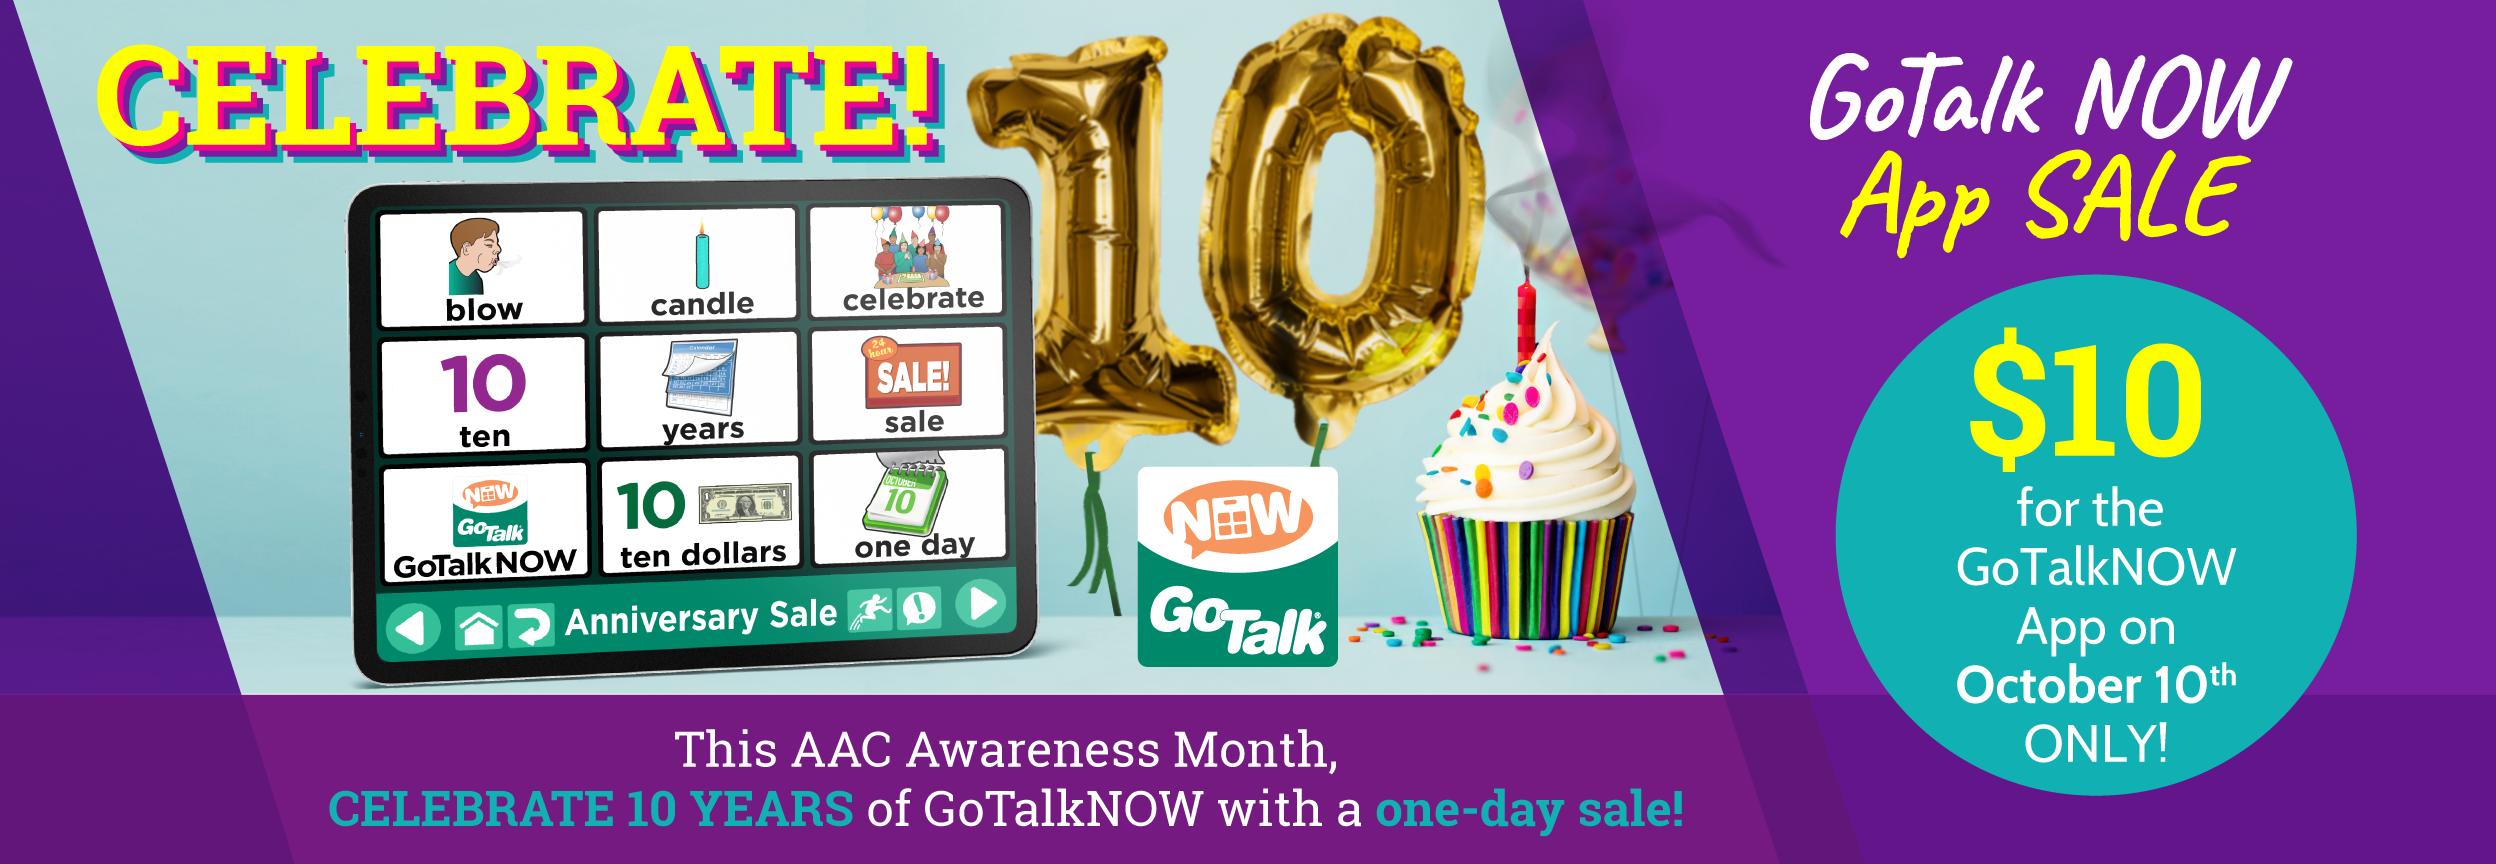 GoTalk NOW 10th Anniversary Sale